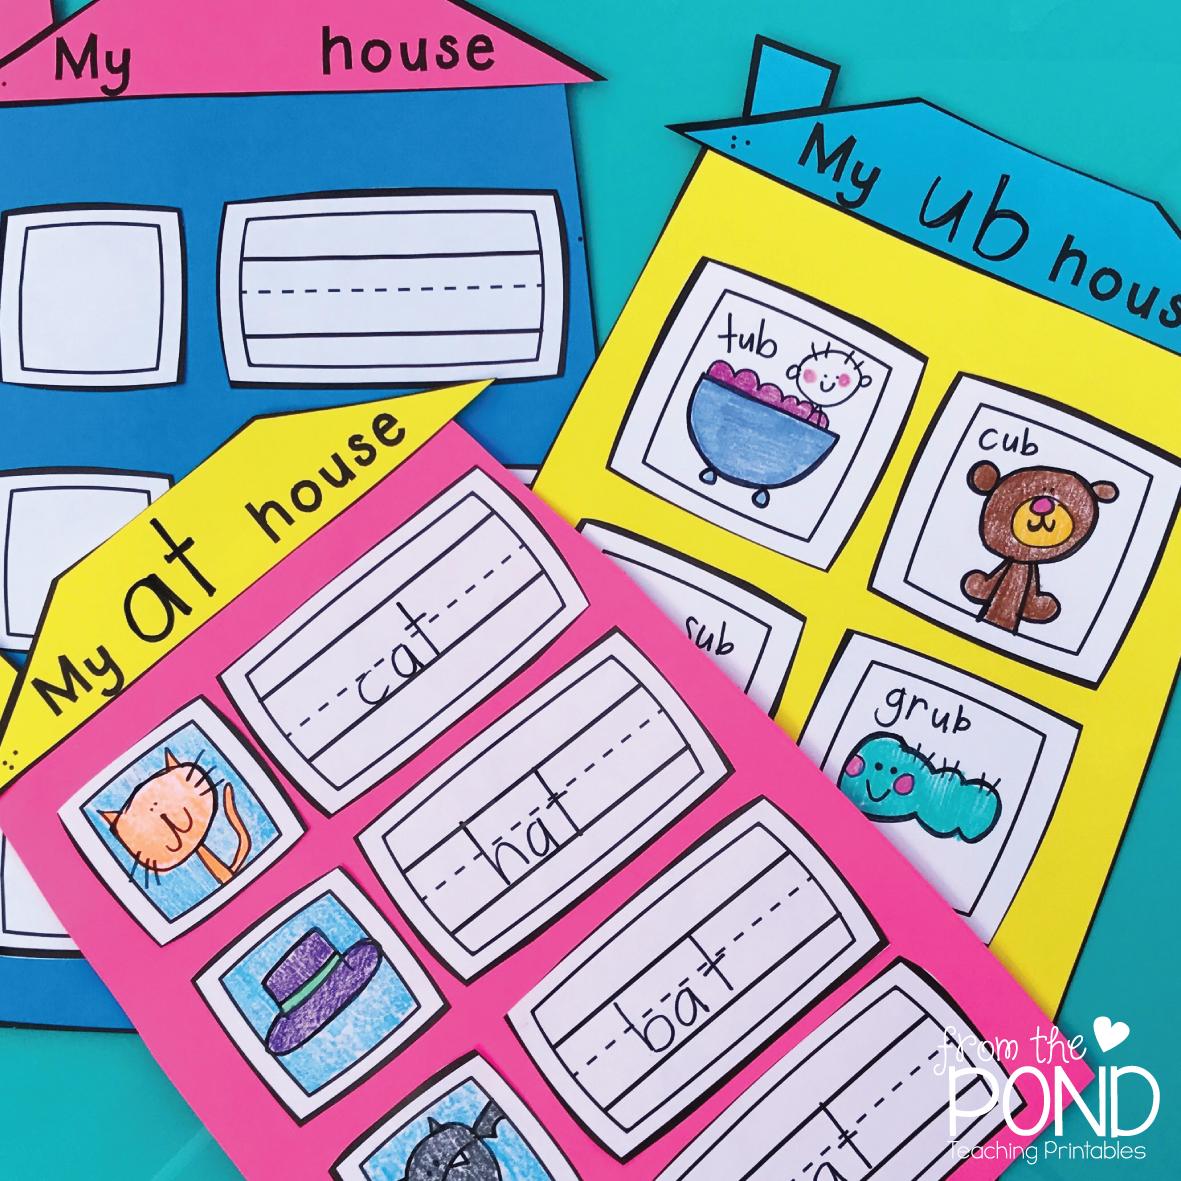 Word Family Houses Word Families Phonics Kindergarten Early Years Classroom